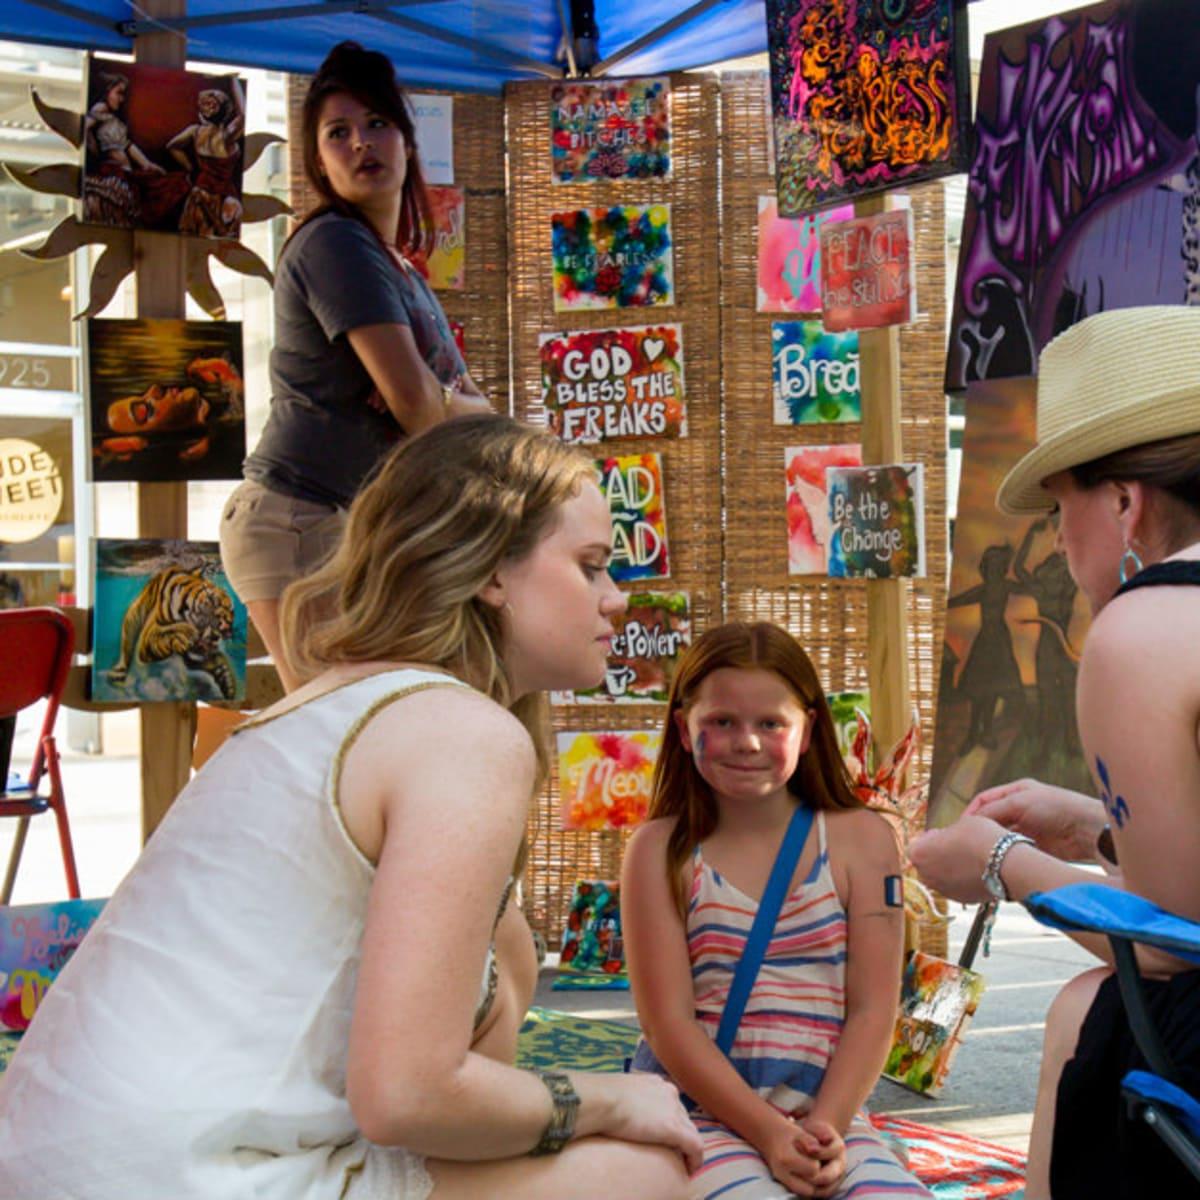 West 7th Crockett Creates art festival